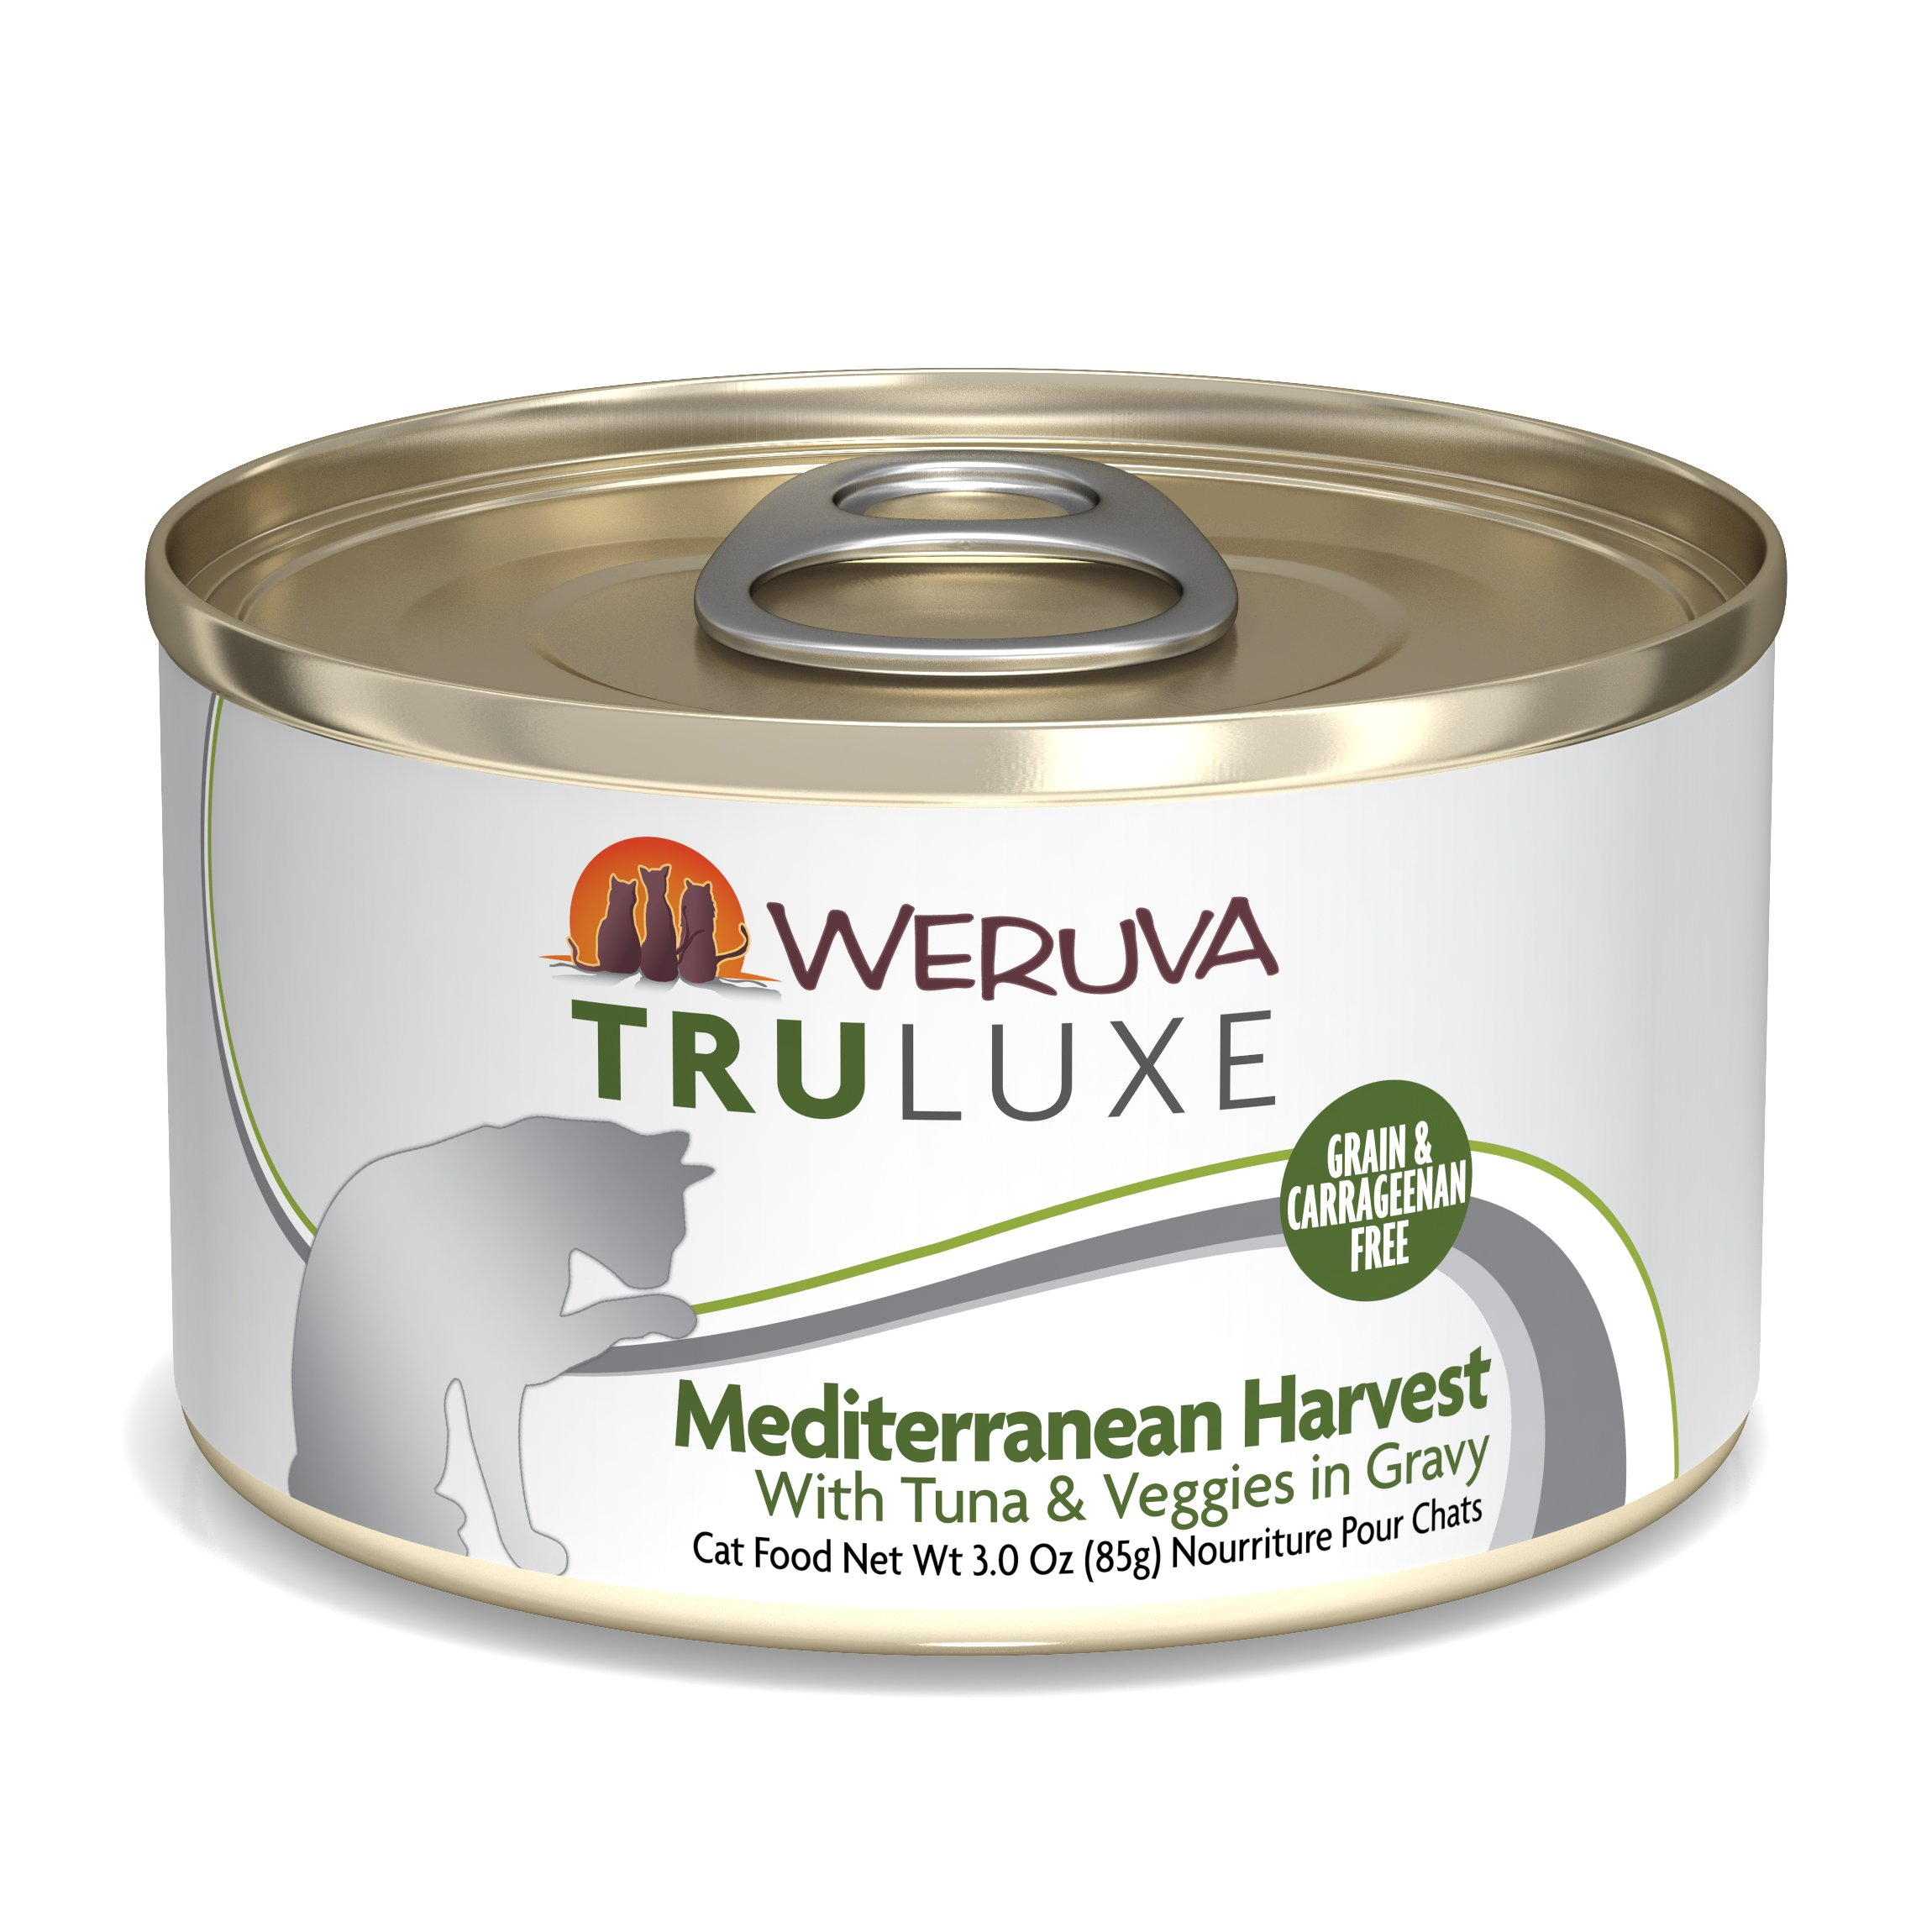 Weruva Truluxe Cat Food, Mediterranean Harvest With Tuna Whole Meat & Veggies In Gravy, 3Oz (Pack Of 24) by Weruva